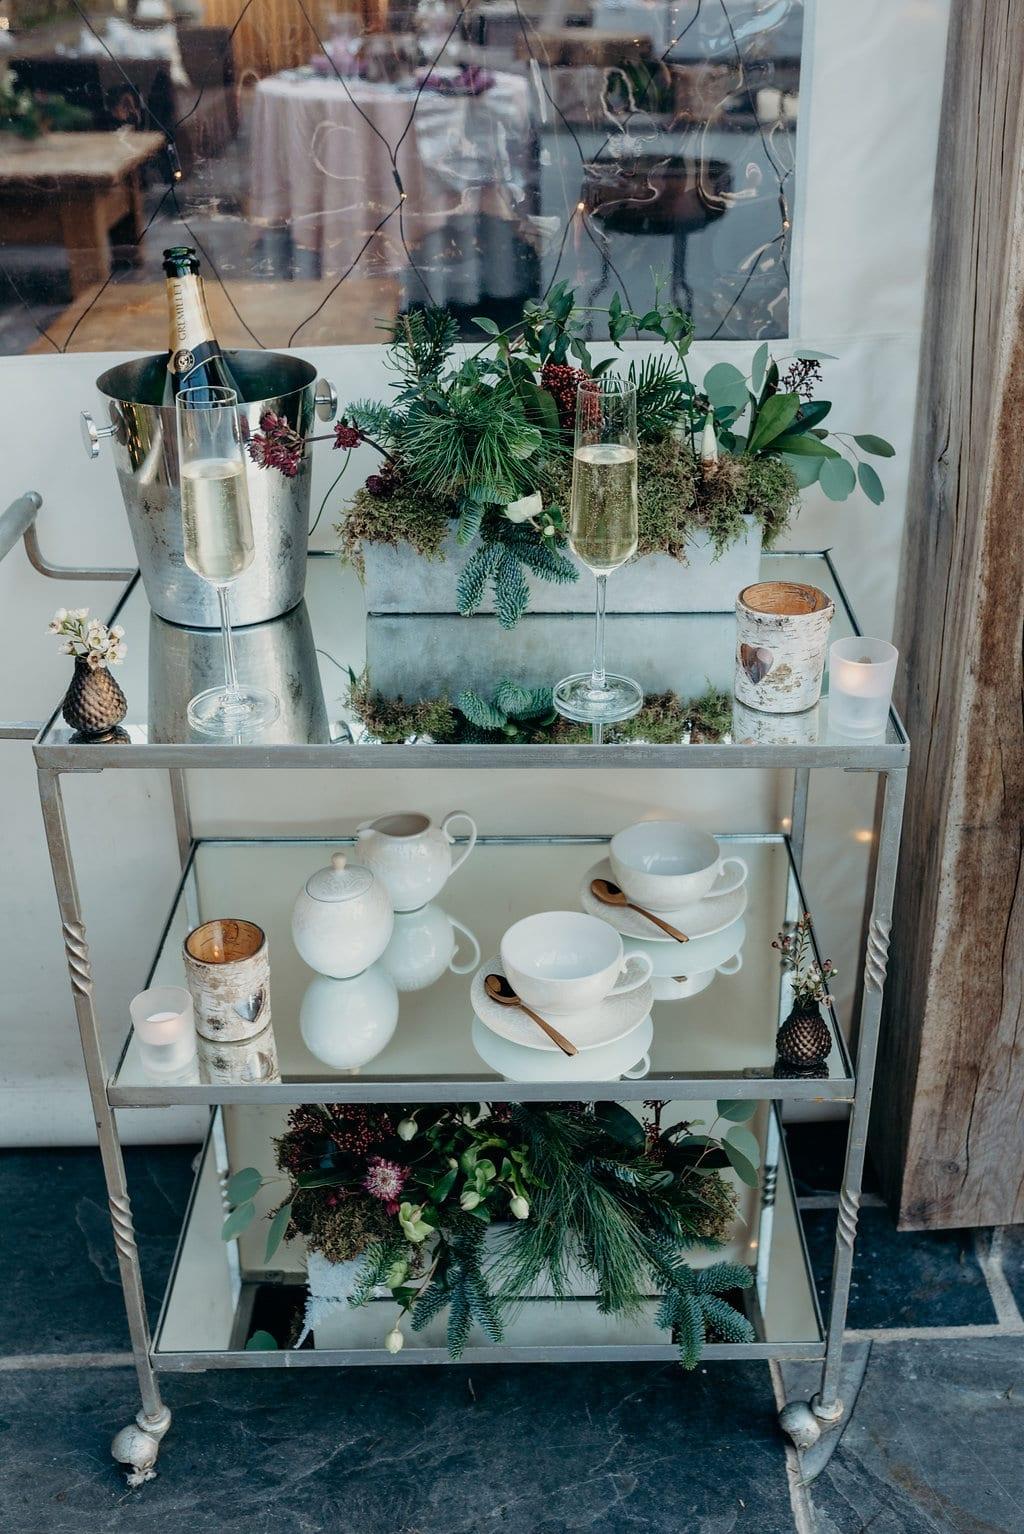 Small elopement wedding tricks trolley December decor